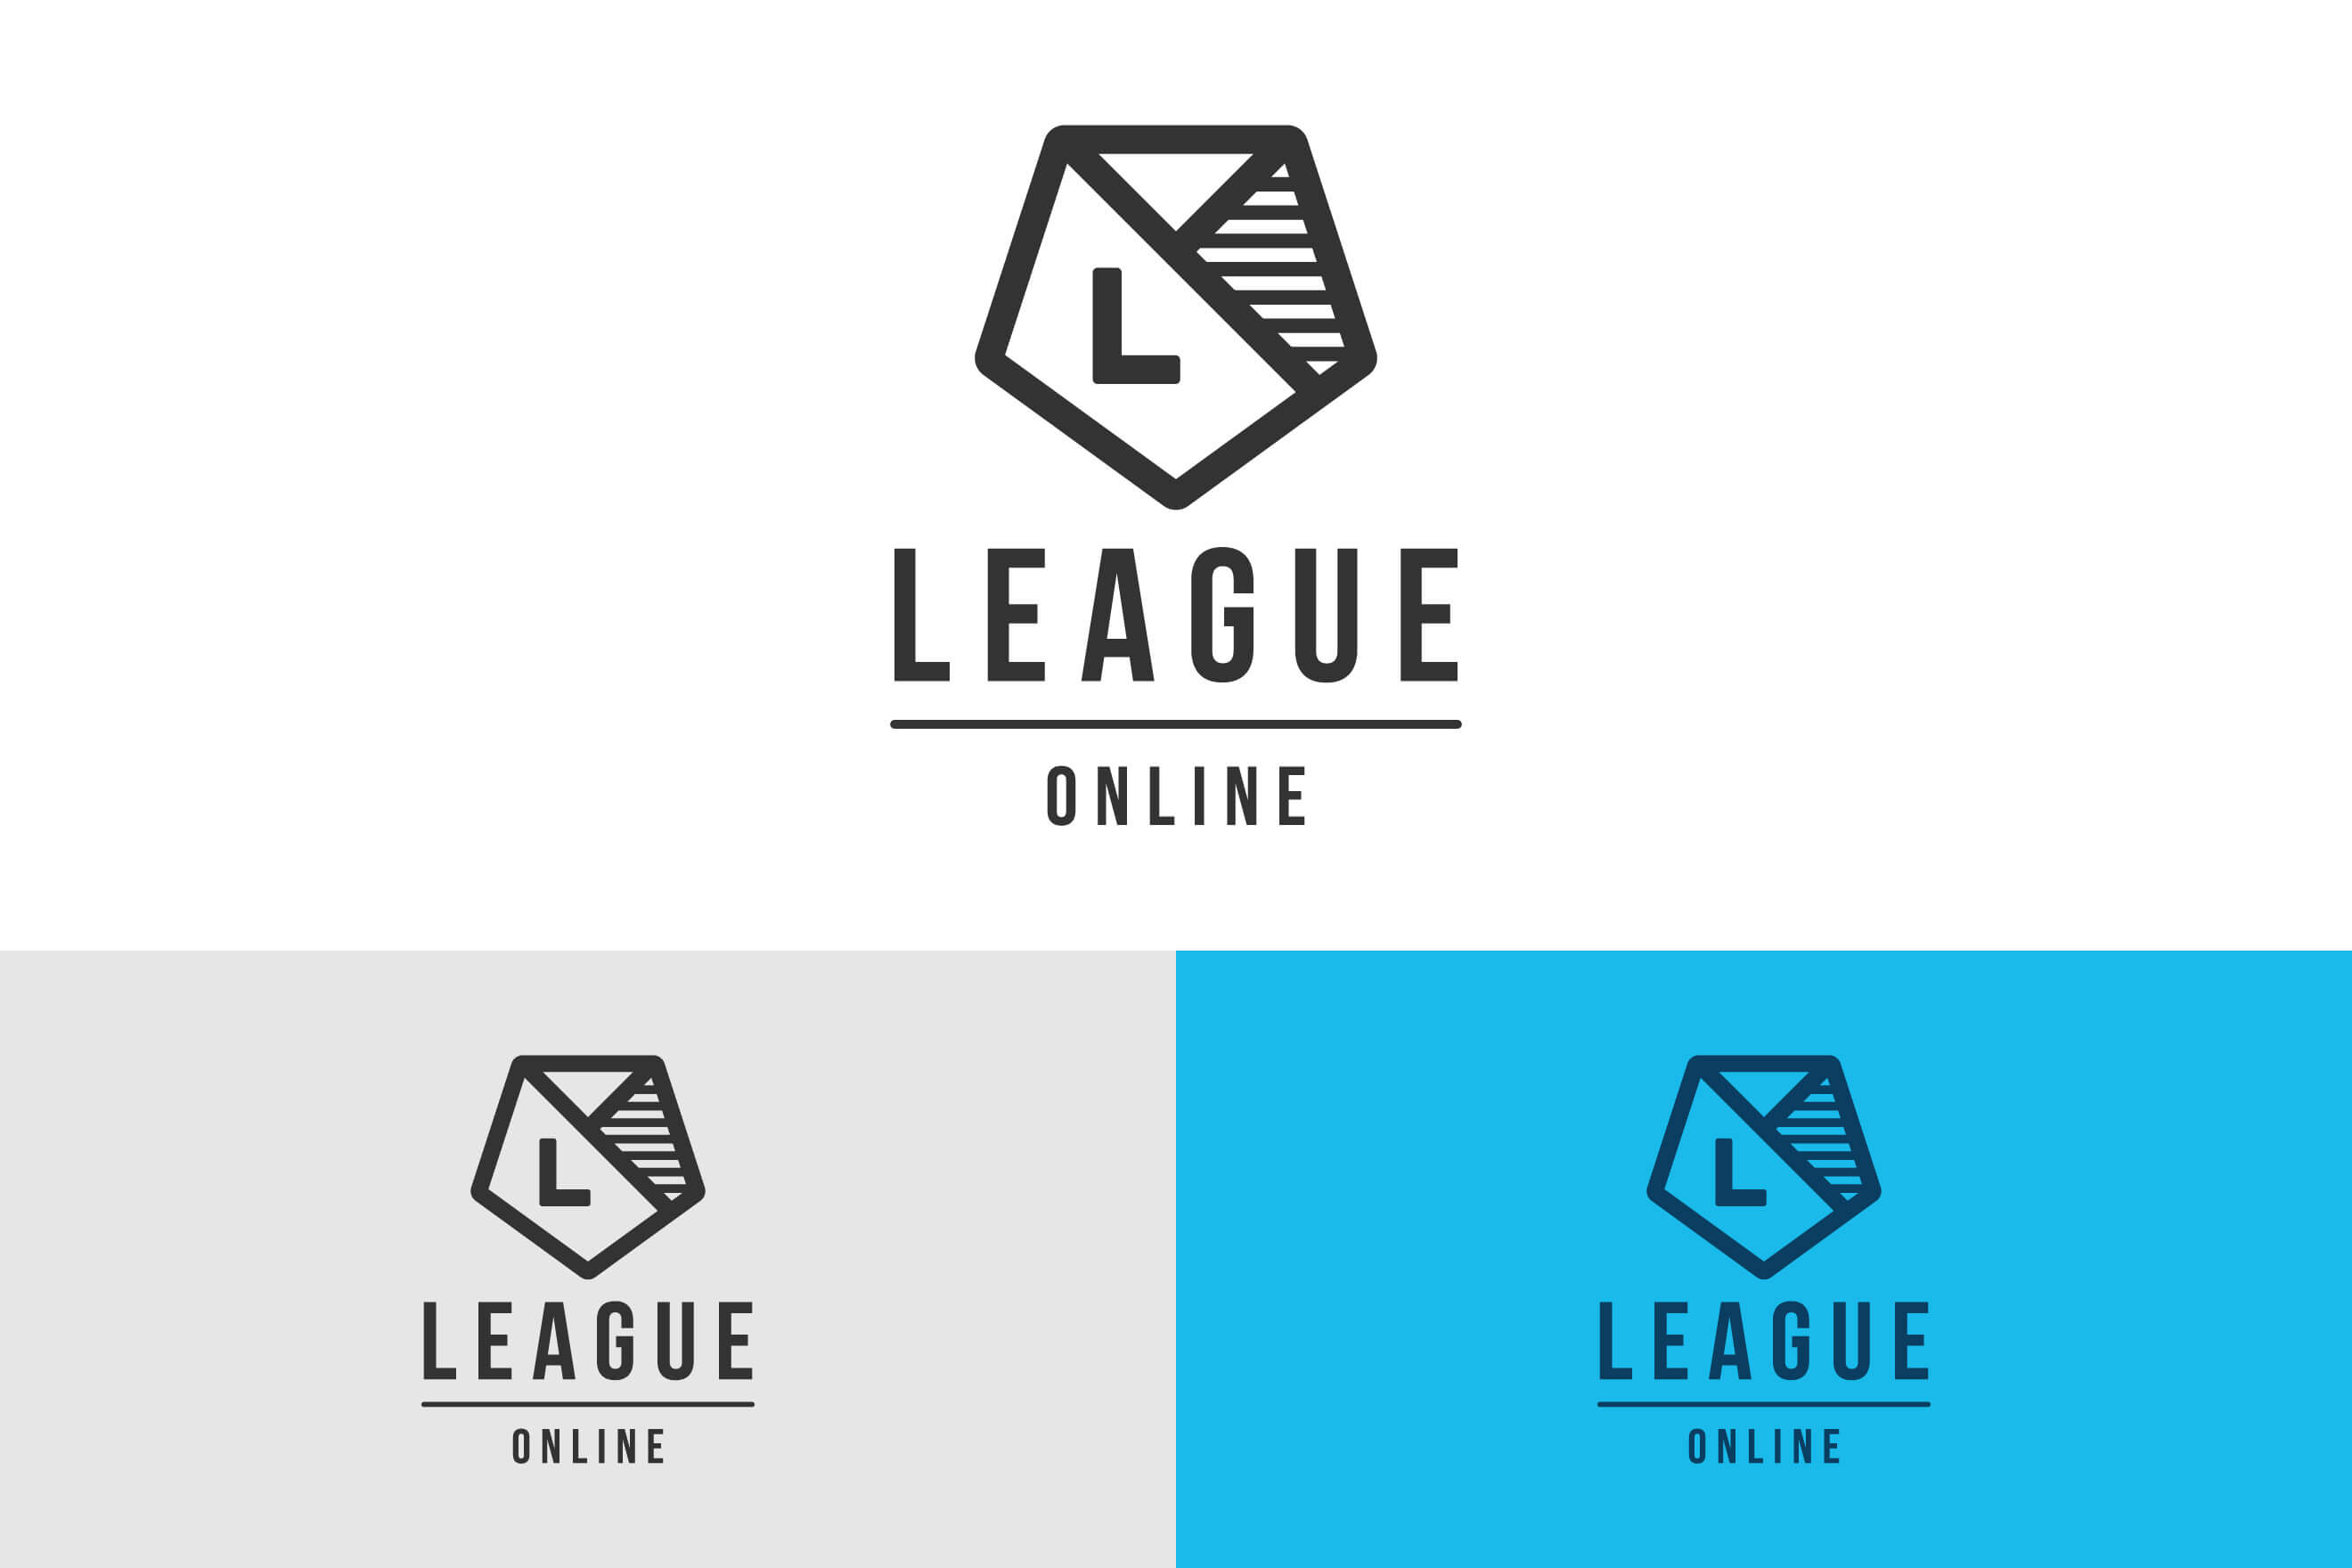 logo design for League Online